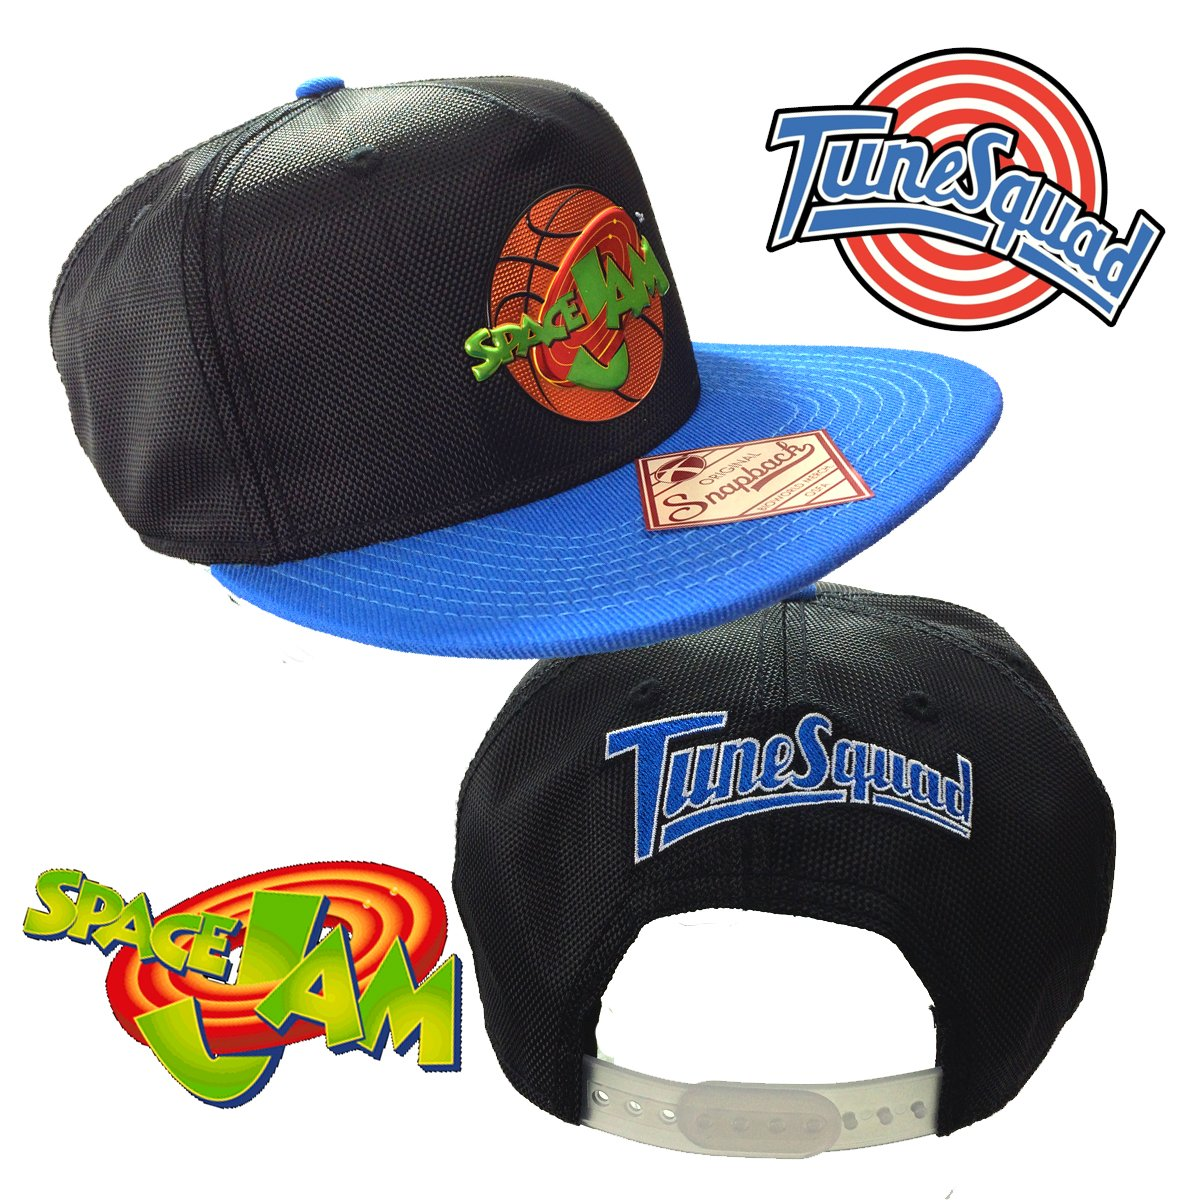 da7e984a215 Amazon.com  Space Jam Retro Tune Squad Looney Tunes Michael Air Jordan 11  Nike Basketball Snapback Hat Cap  Clothing